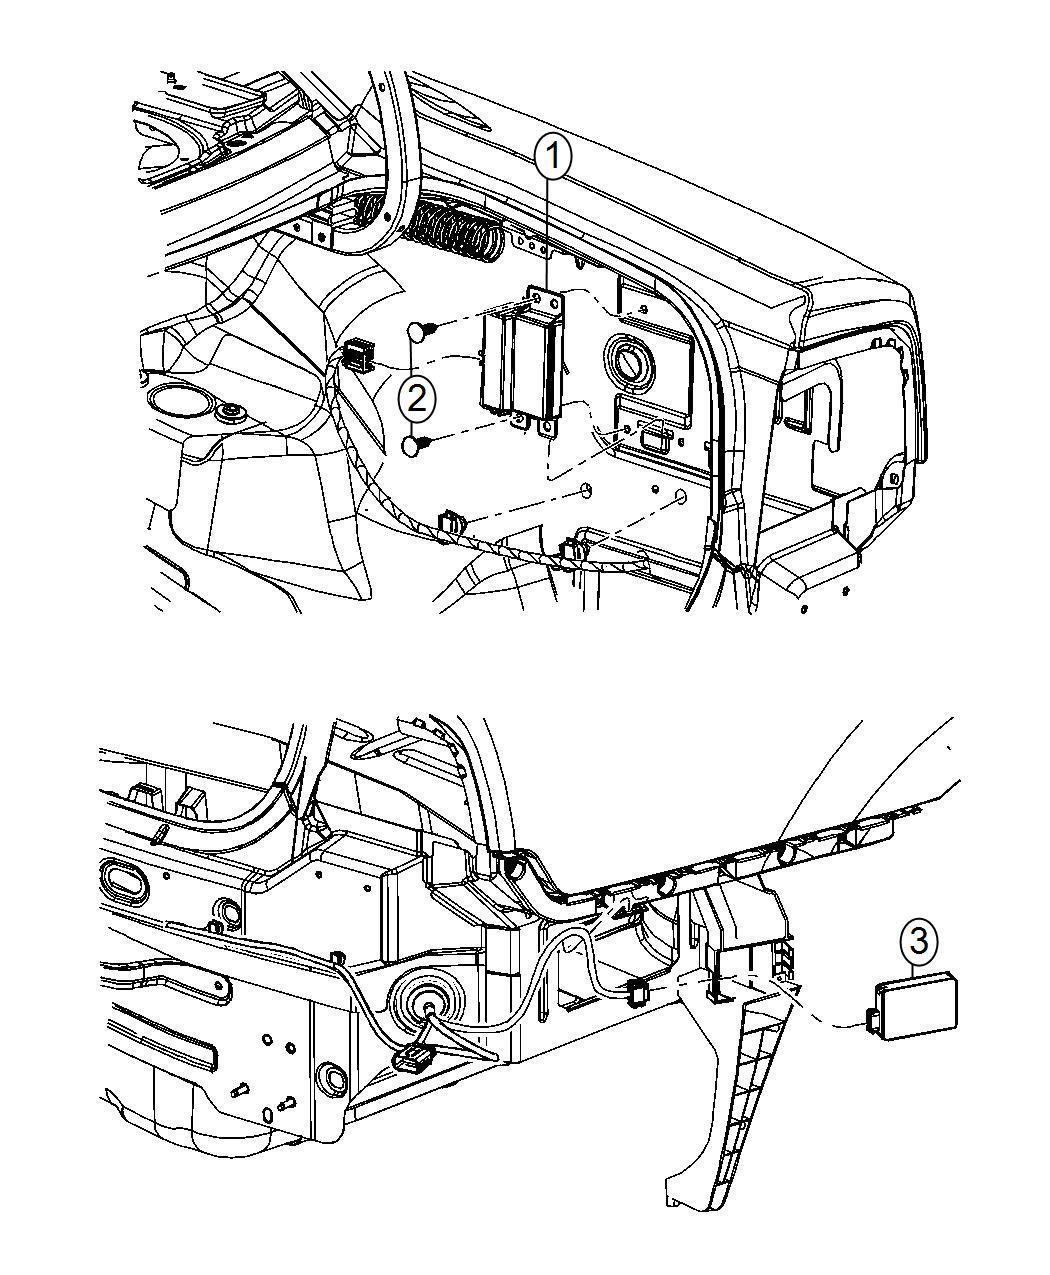 Chrysler 300 Module Blind Spot Detection Path